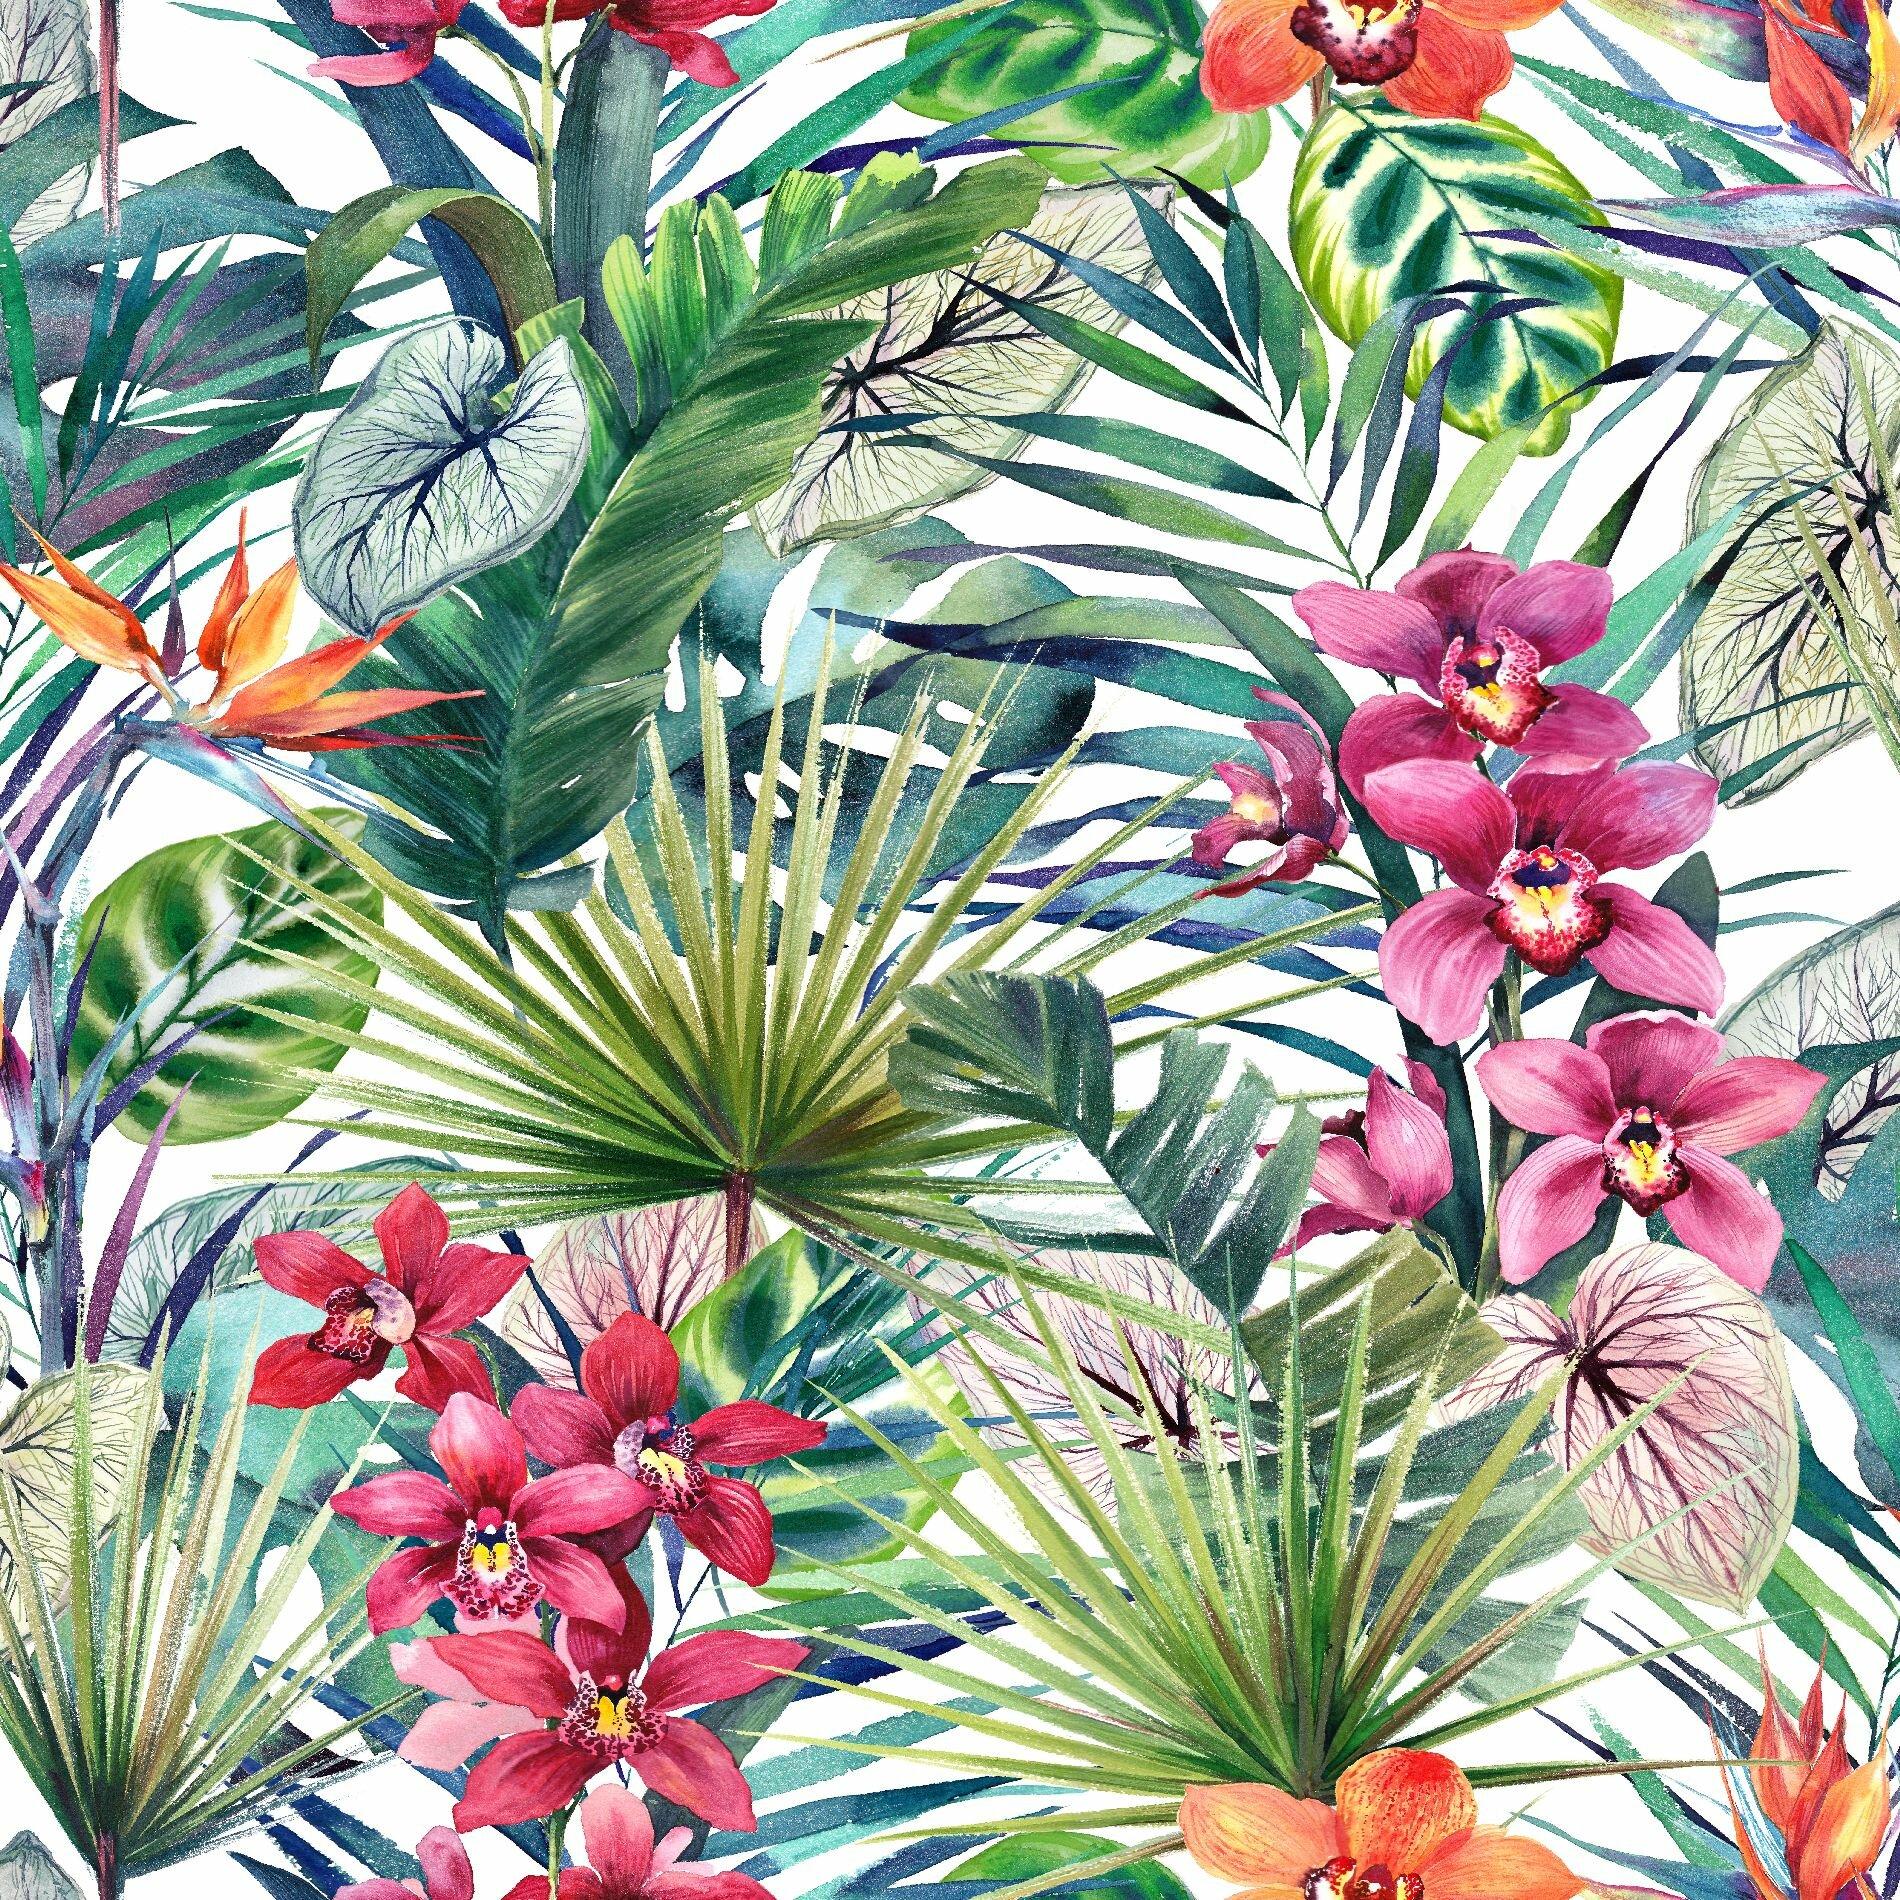 East Urban Home 10m X 52cm Aloha Tropical Wallpaper Roll Wayfaircouk